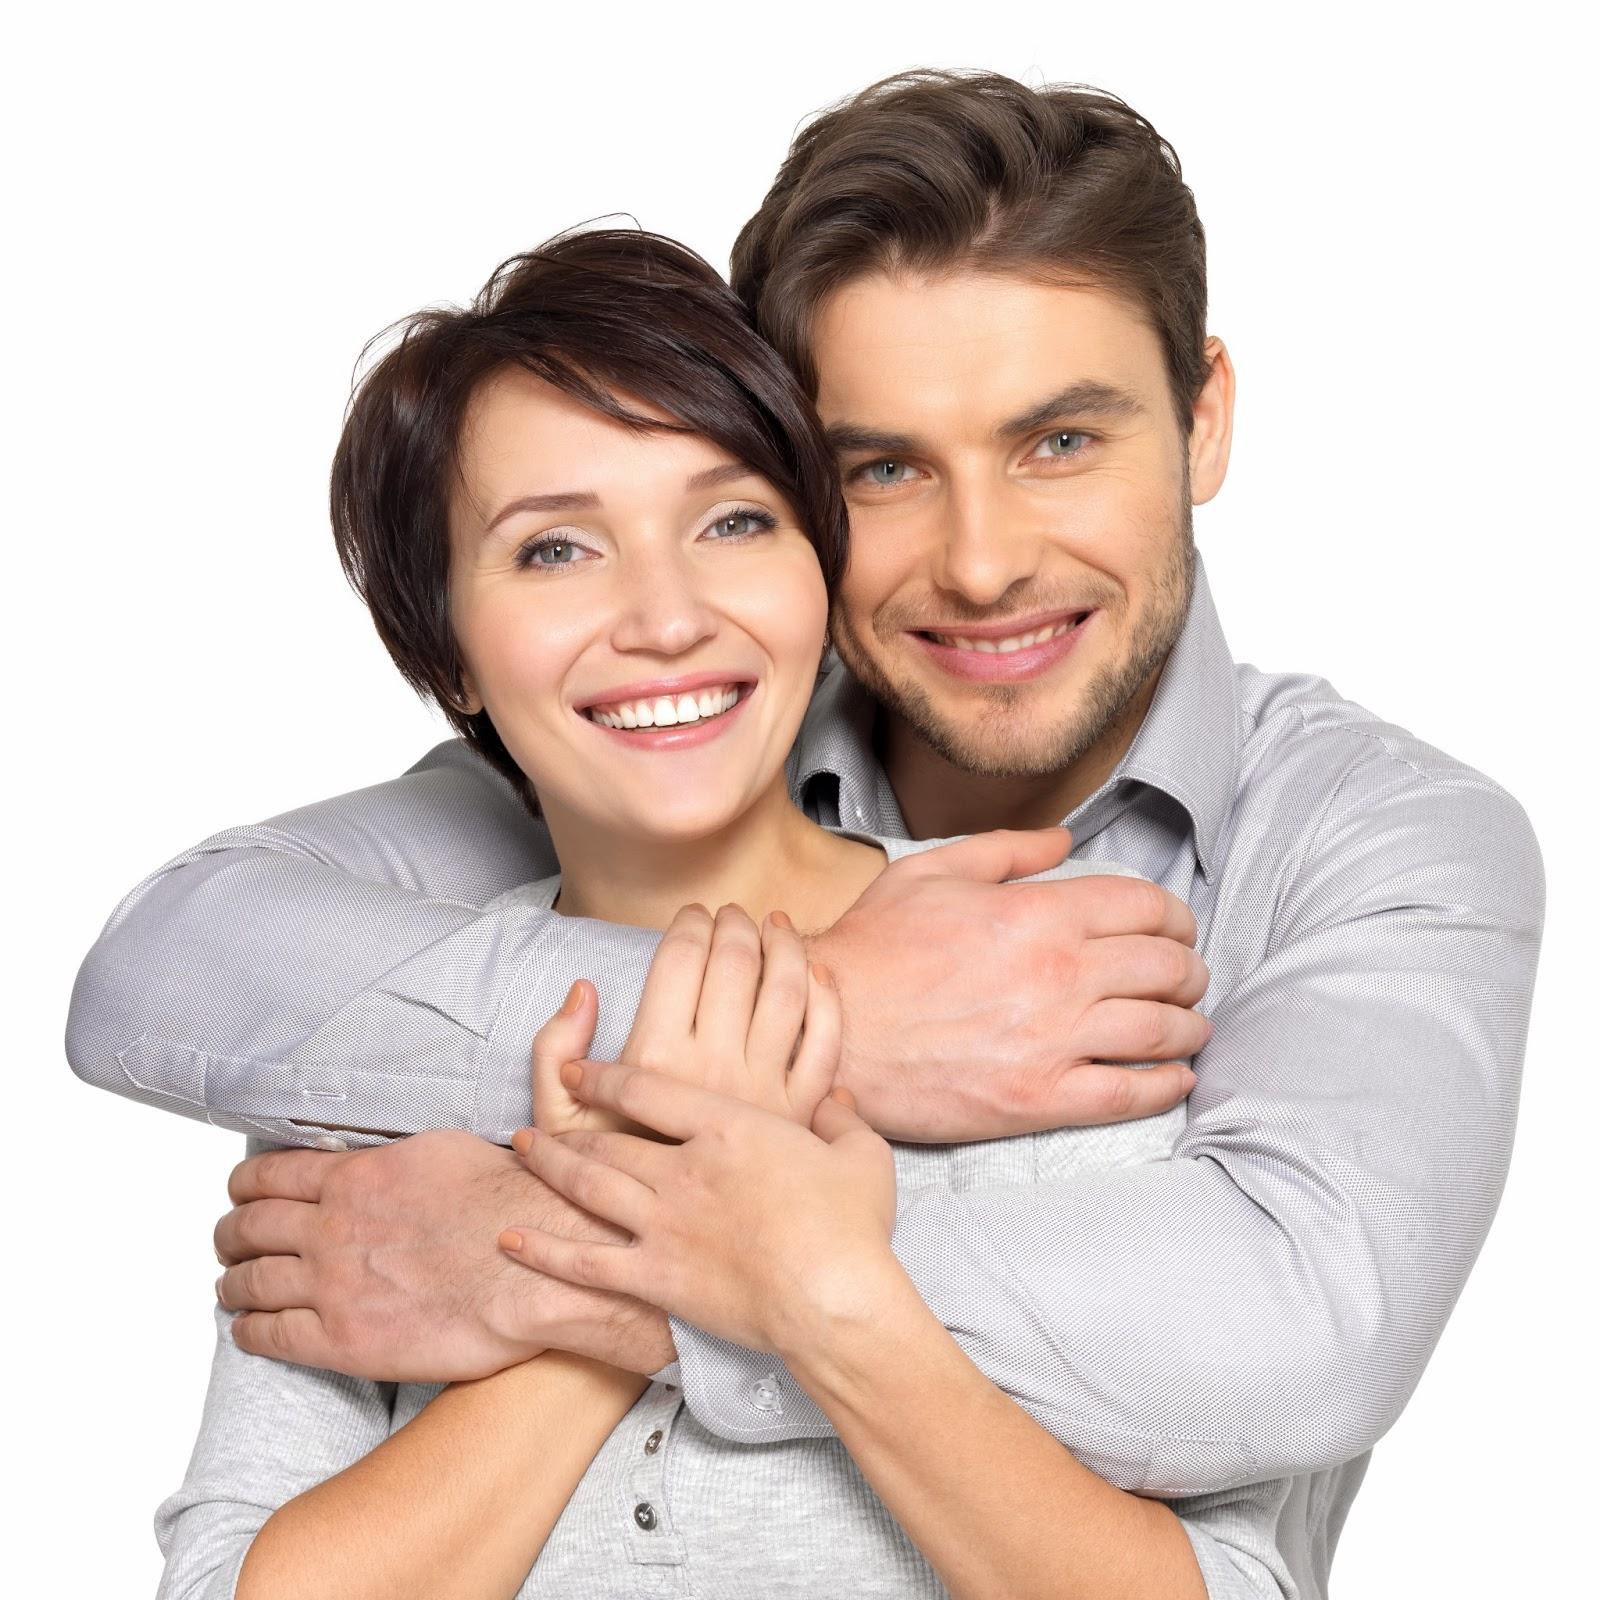 жена сосет у мужа домашнее